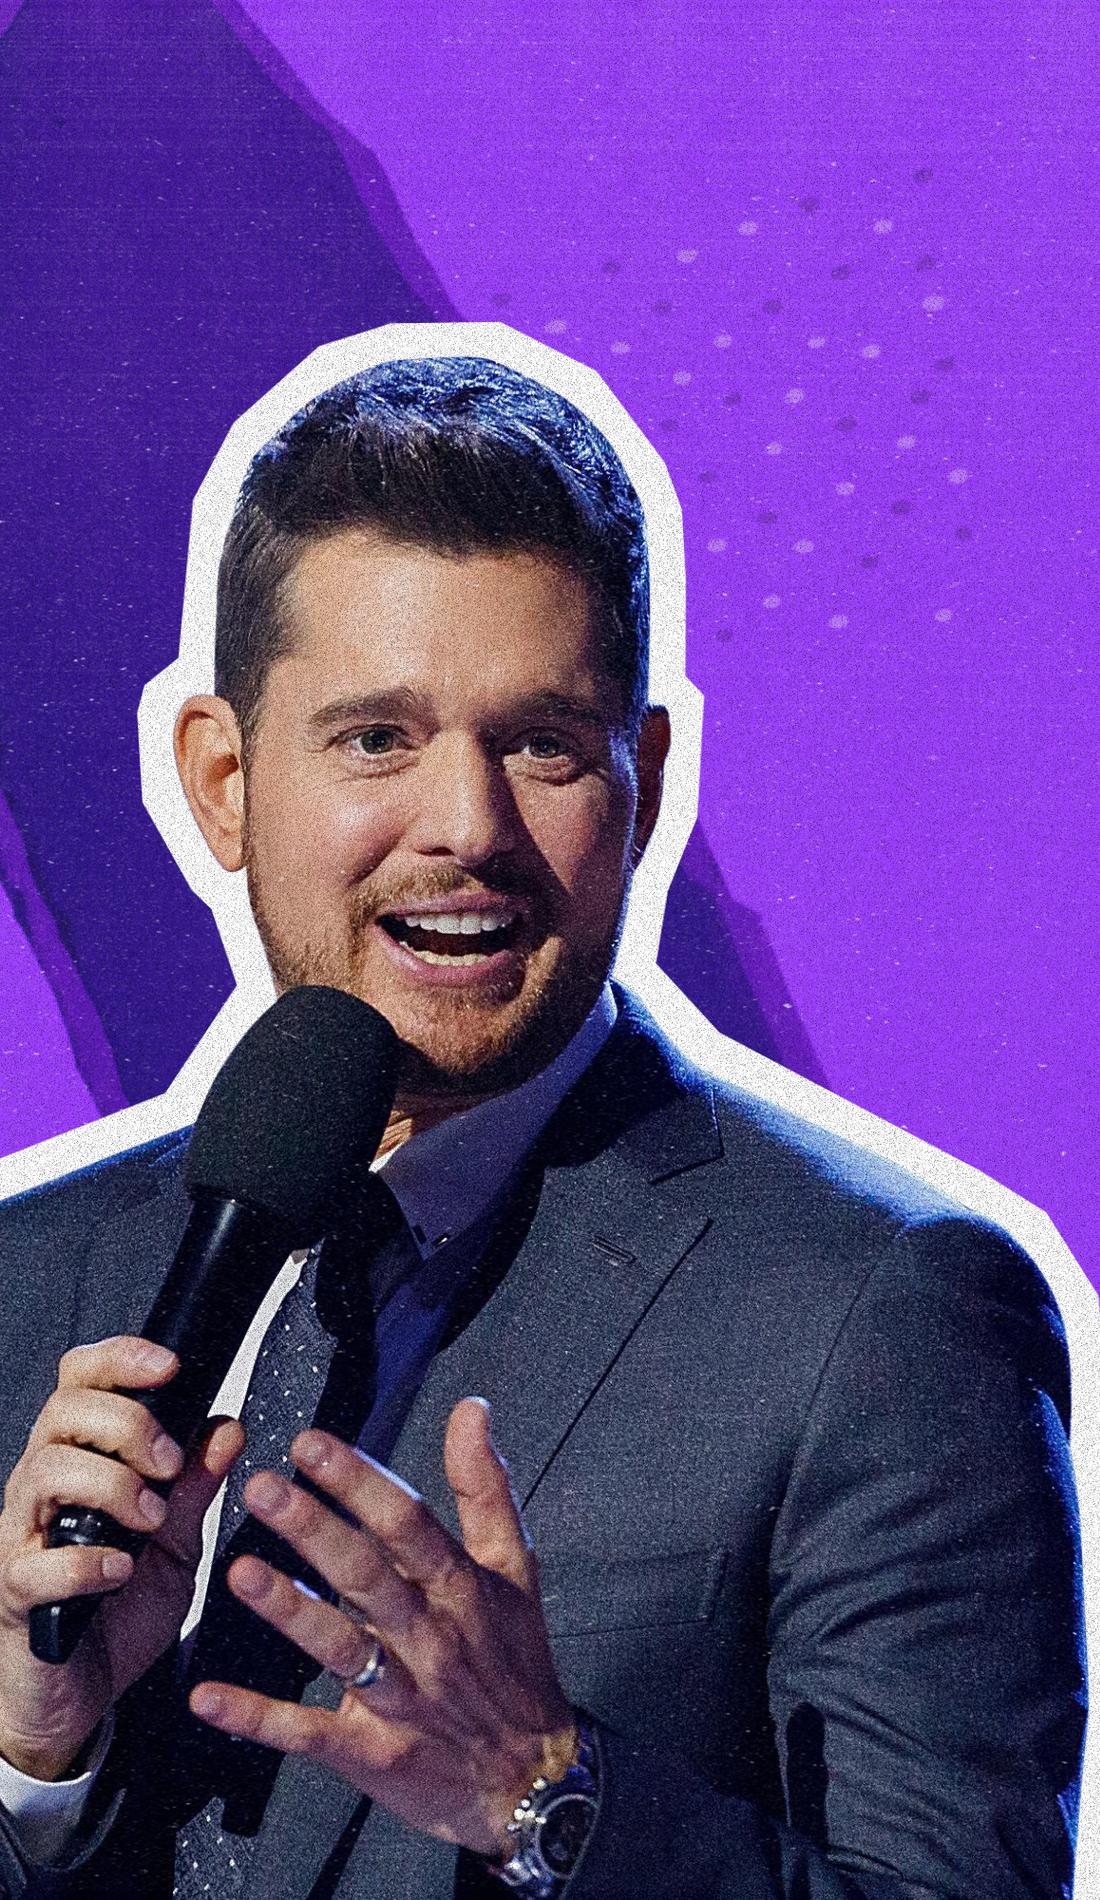 A Michael Buble live event